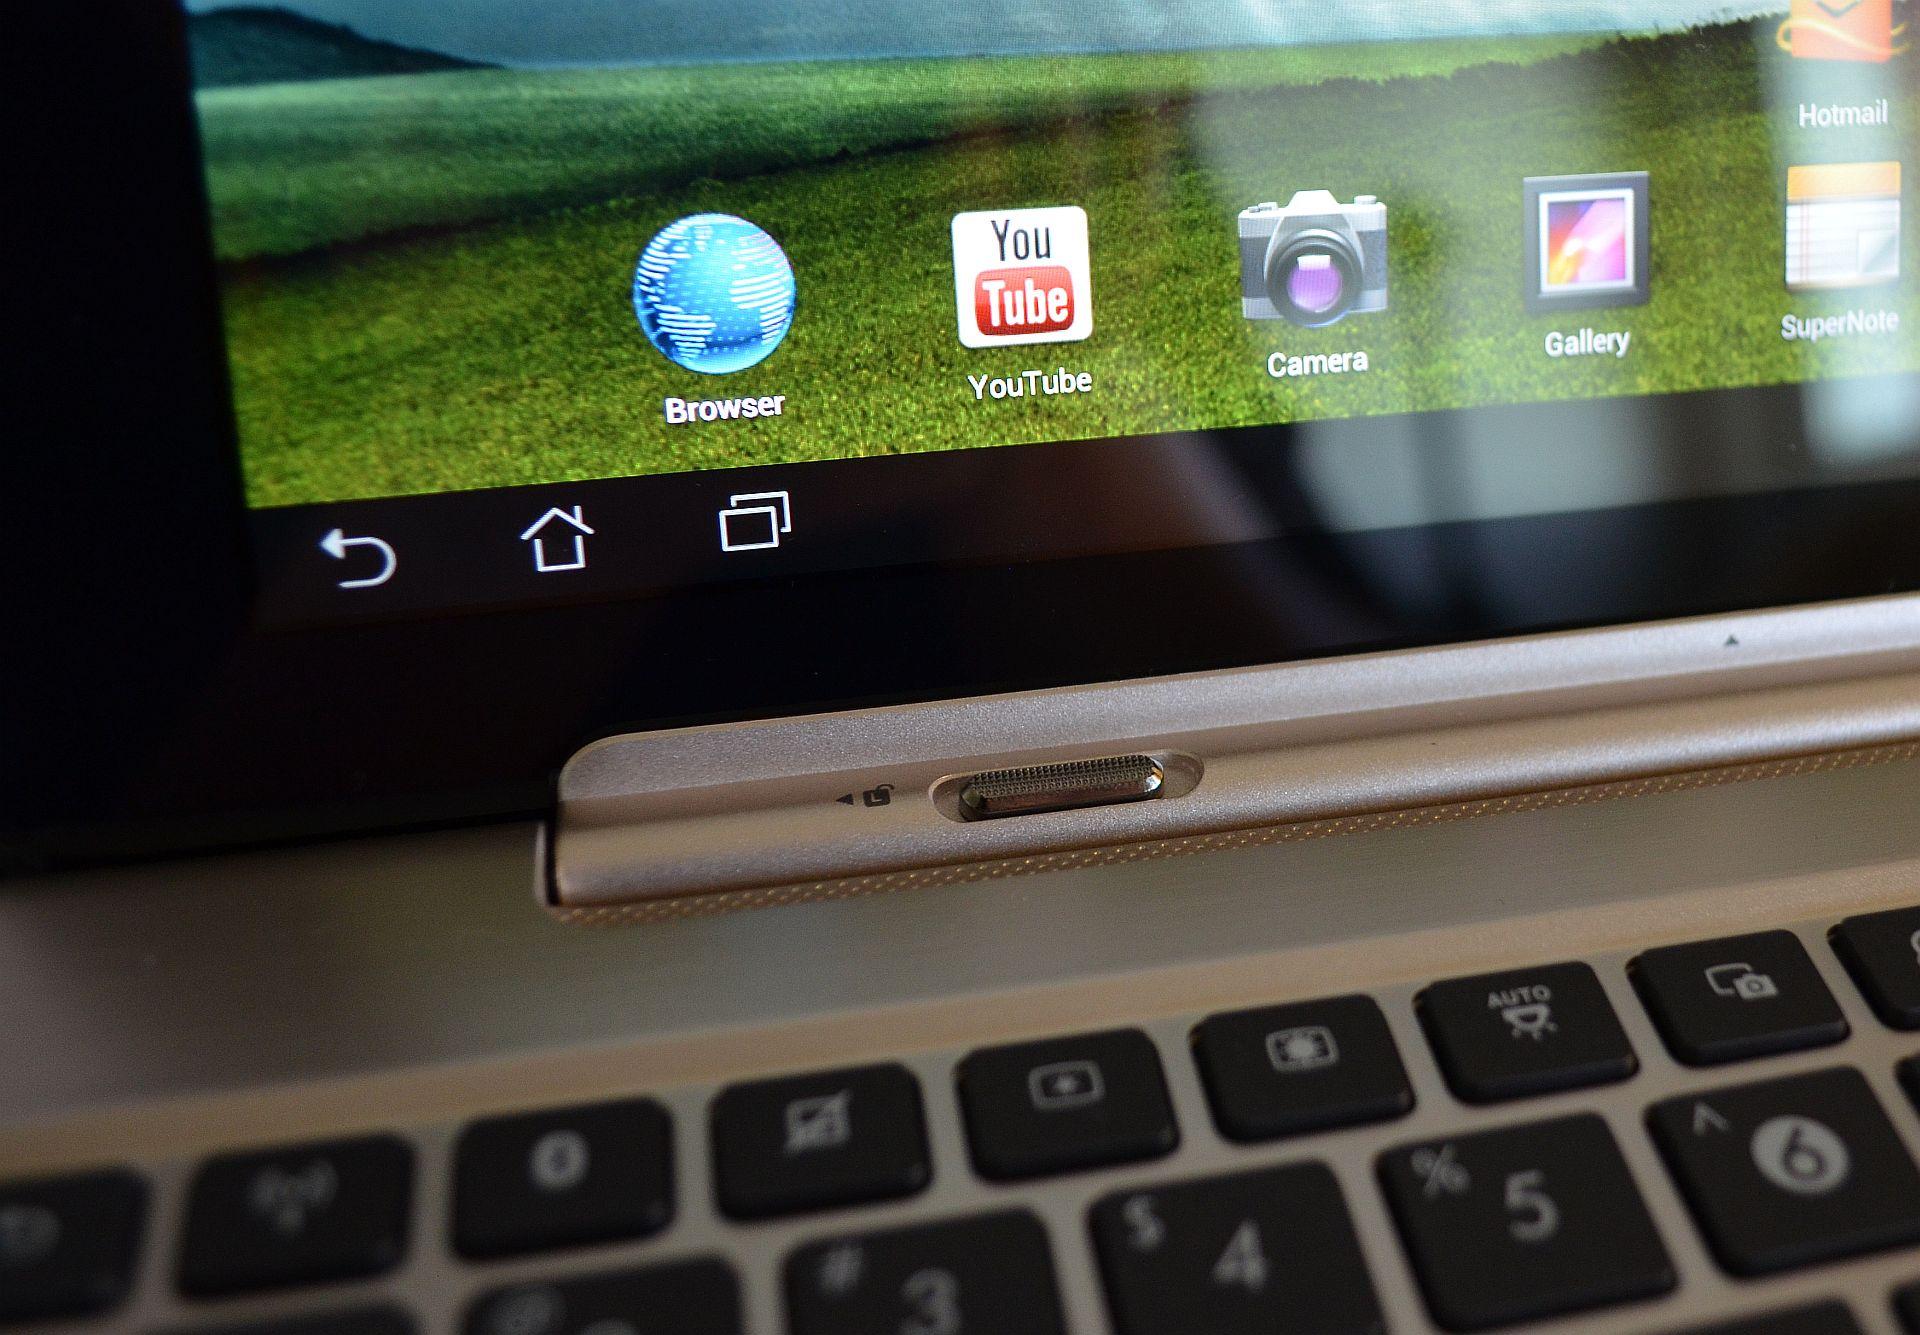 ASUS Transformer Infinity – Noul rege al tabletelor Android [REVIEW]